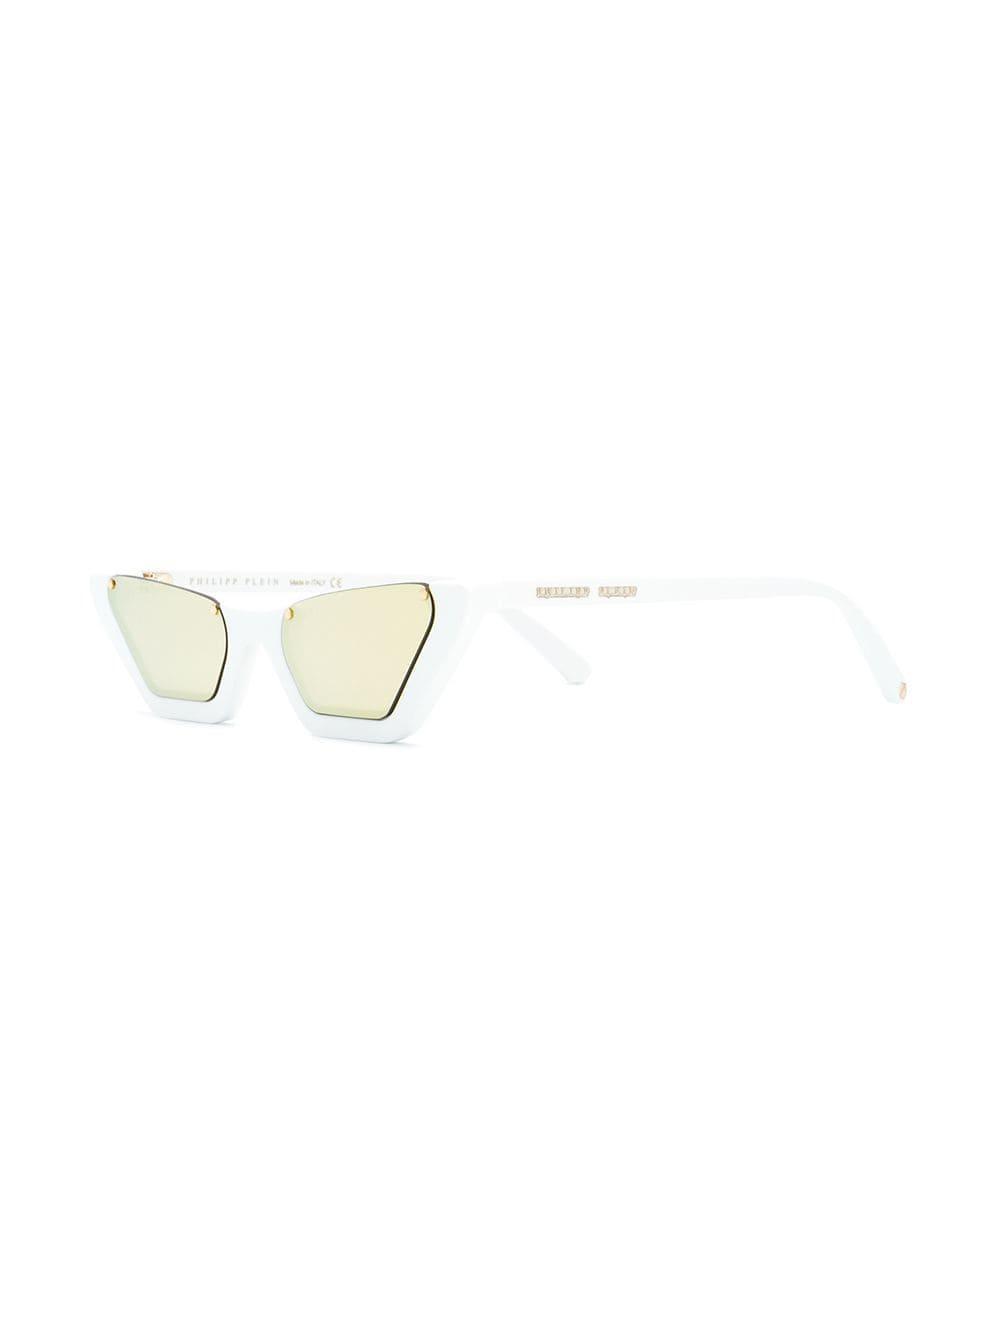 4046e12b318 Philipp Plein Cut-out Slim Sunglasses in White - Lyst